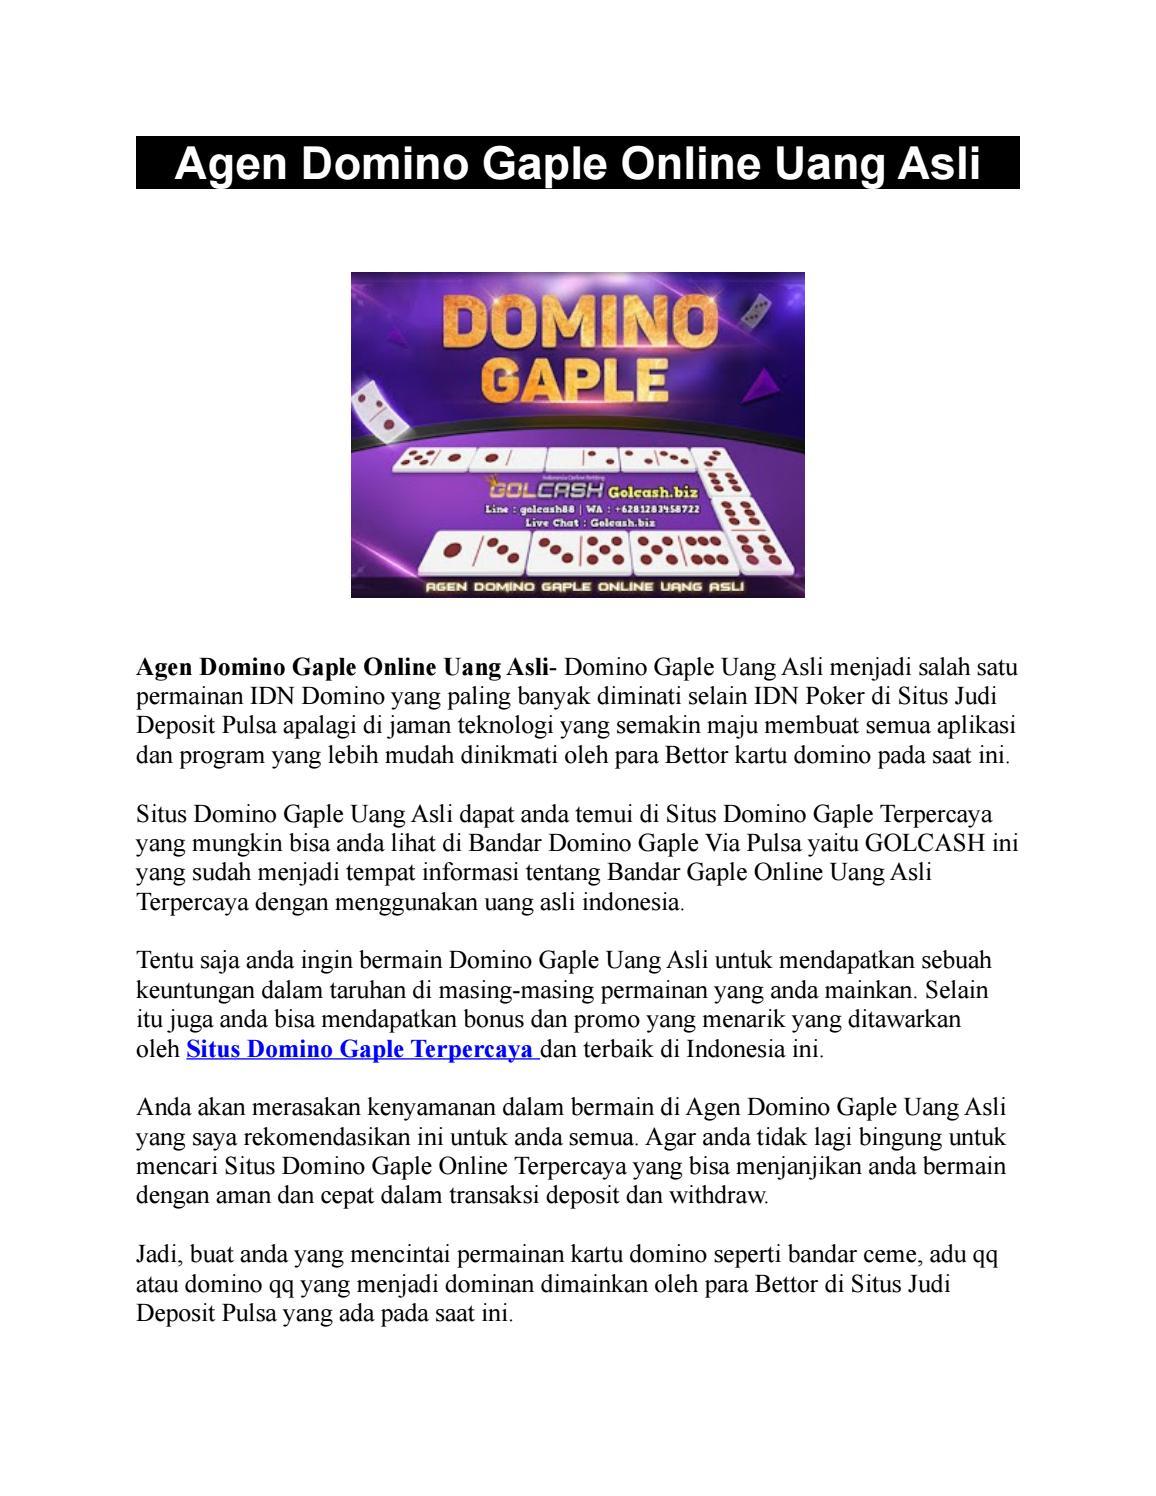 Golcash Agen Domino Gaple Online Uang Asli By Golcash Issuu